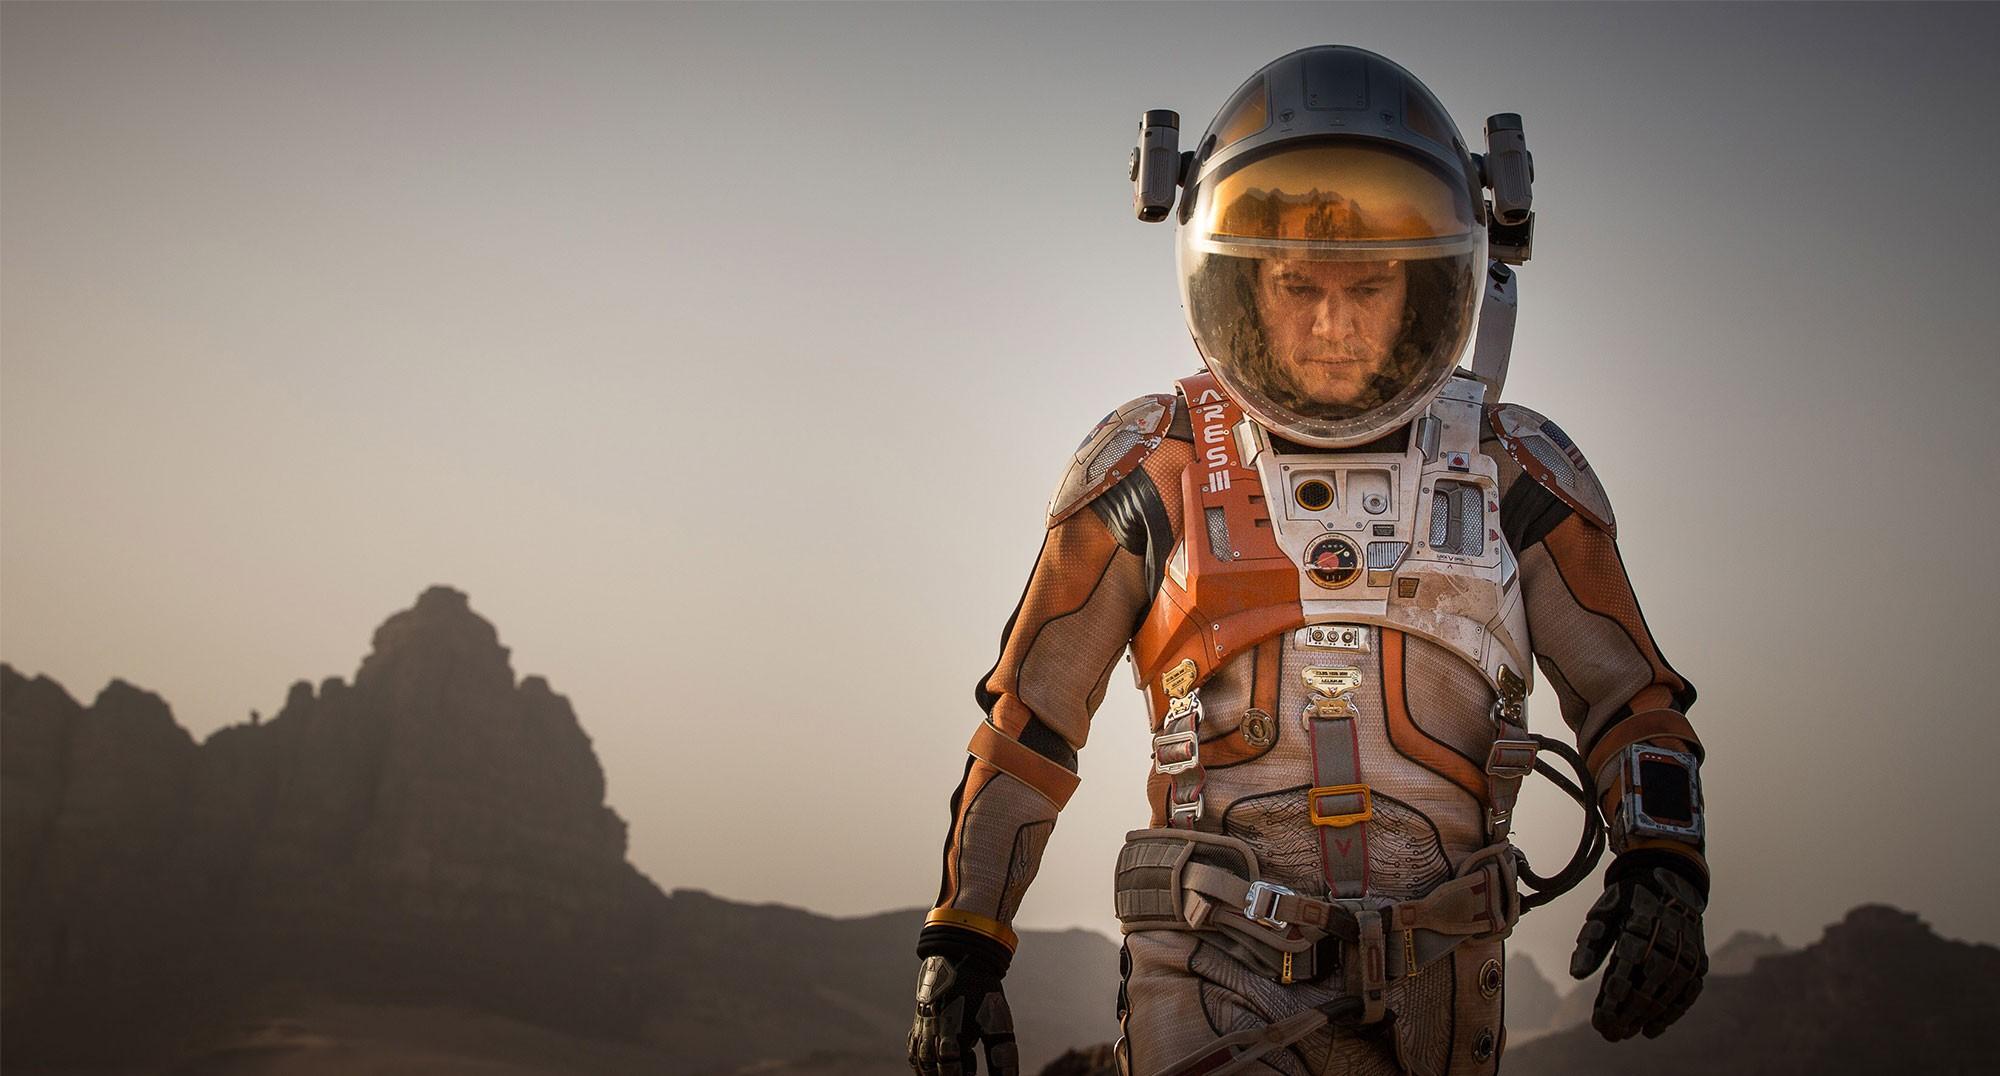 'The Martian' to premiere at Toronto International Film Festival